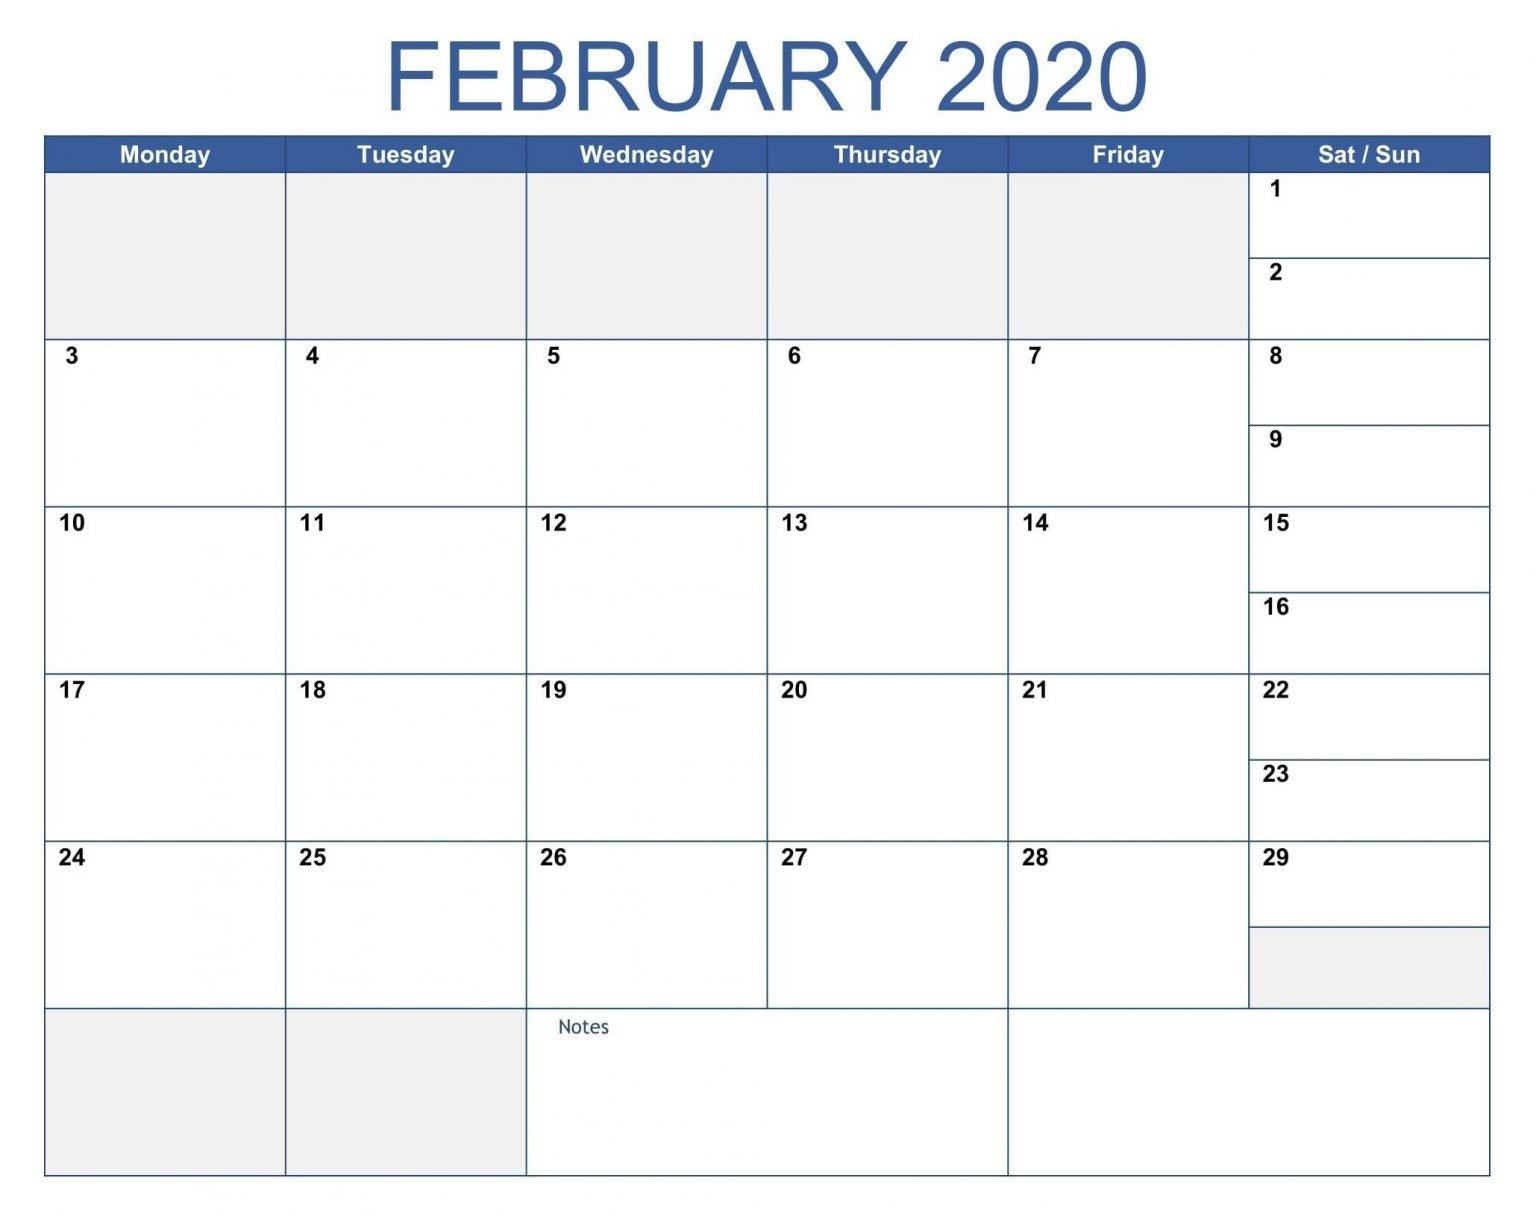 2019 Calendar 8 1/2 X 11 : Free Calendar Template If Depo Given Jan 6 When Is Next Depo Shot Due